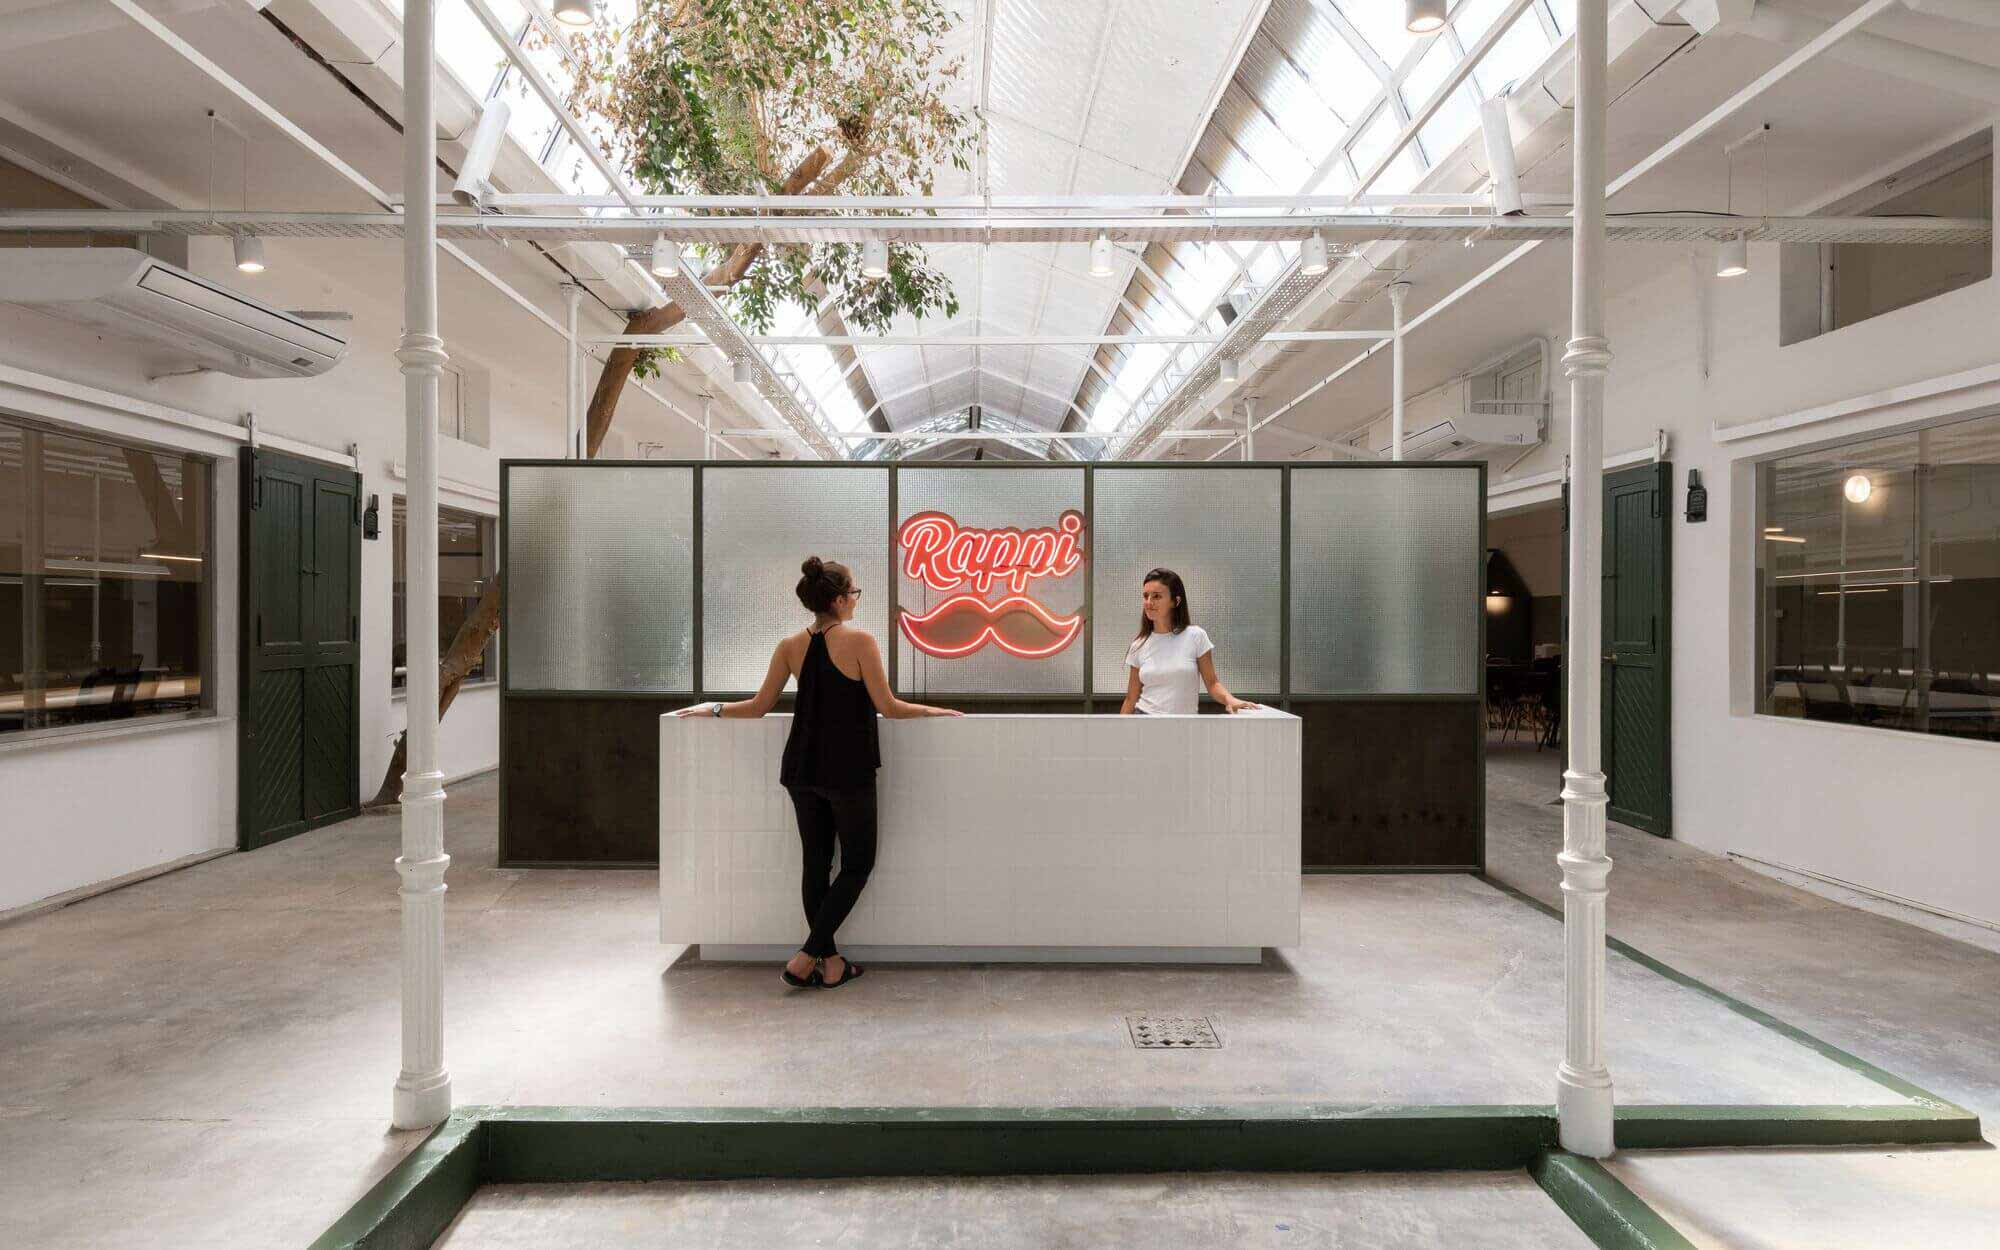 Офисы Rappi в Аргентине / Octava Arquitectura